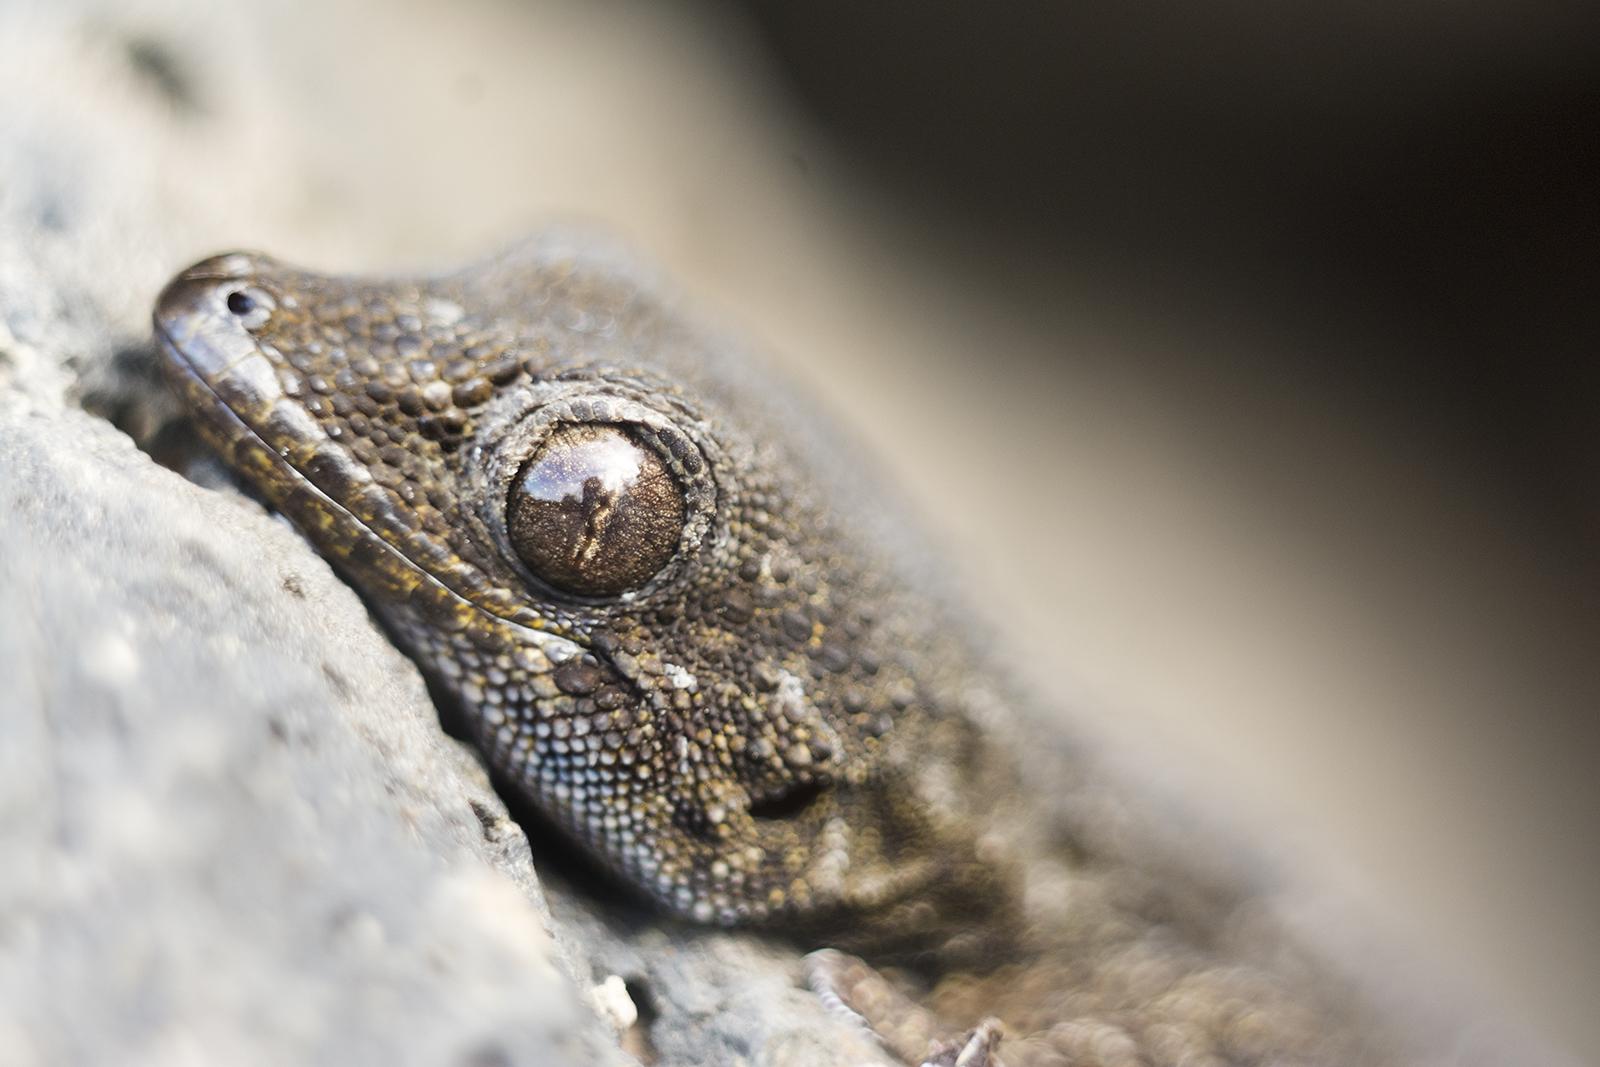 Tenerife gekko close-up